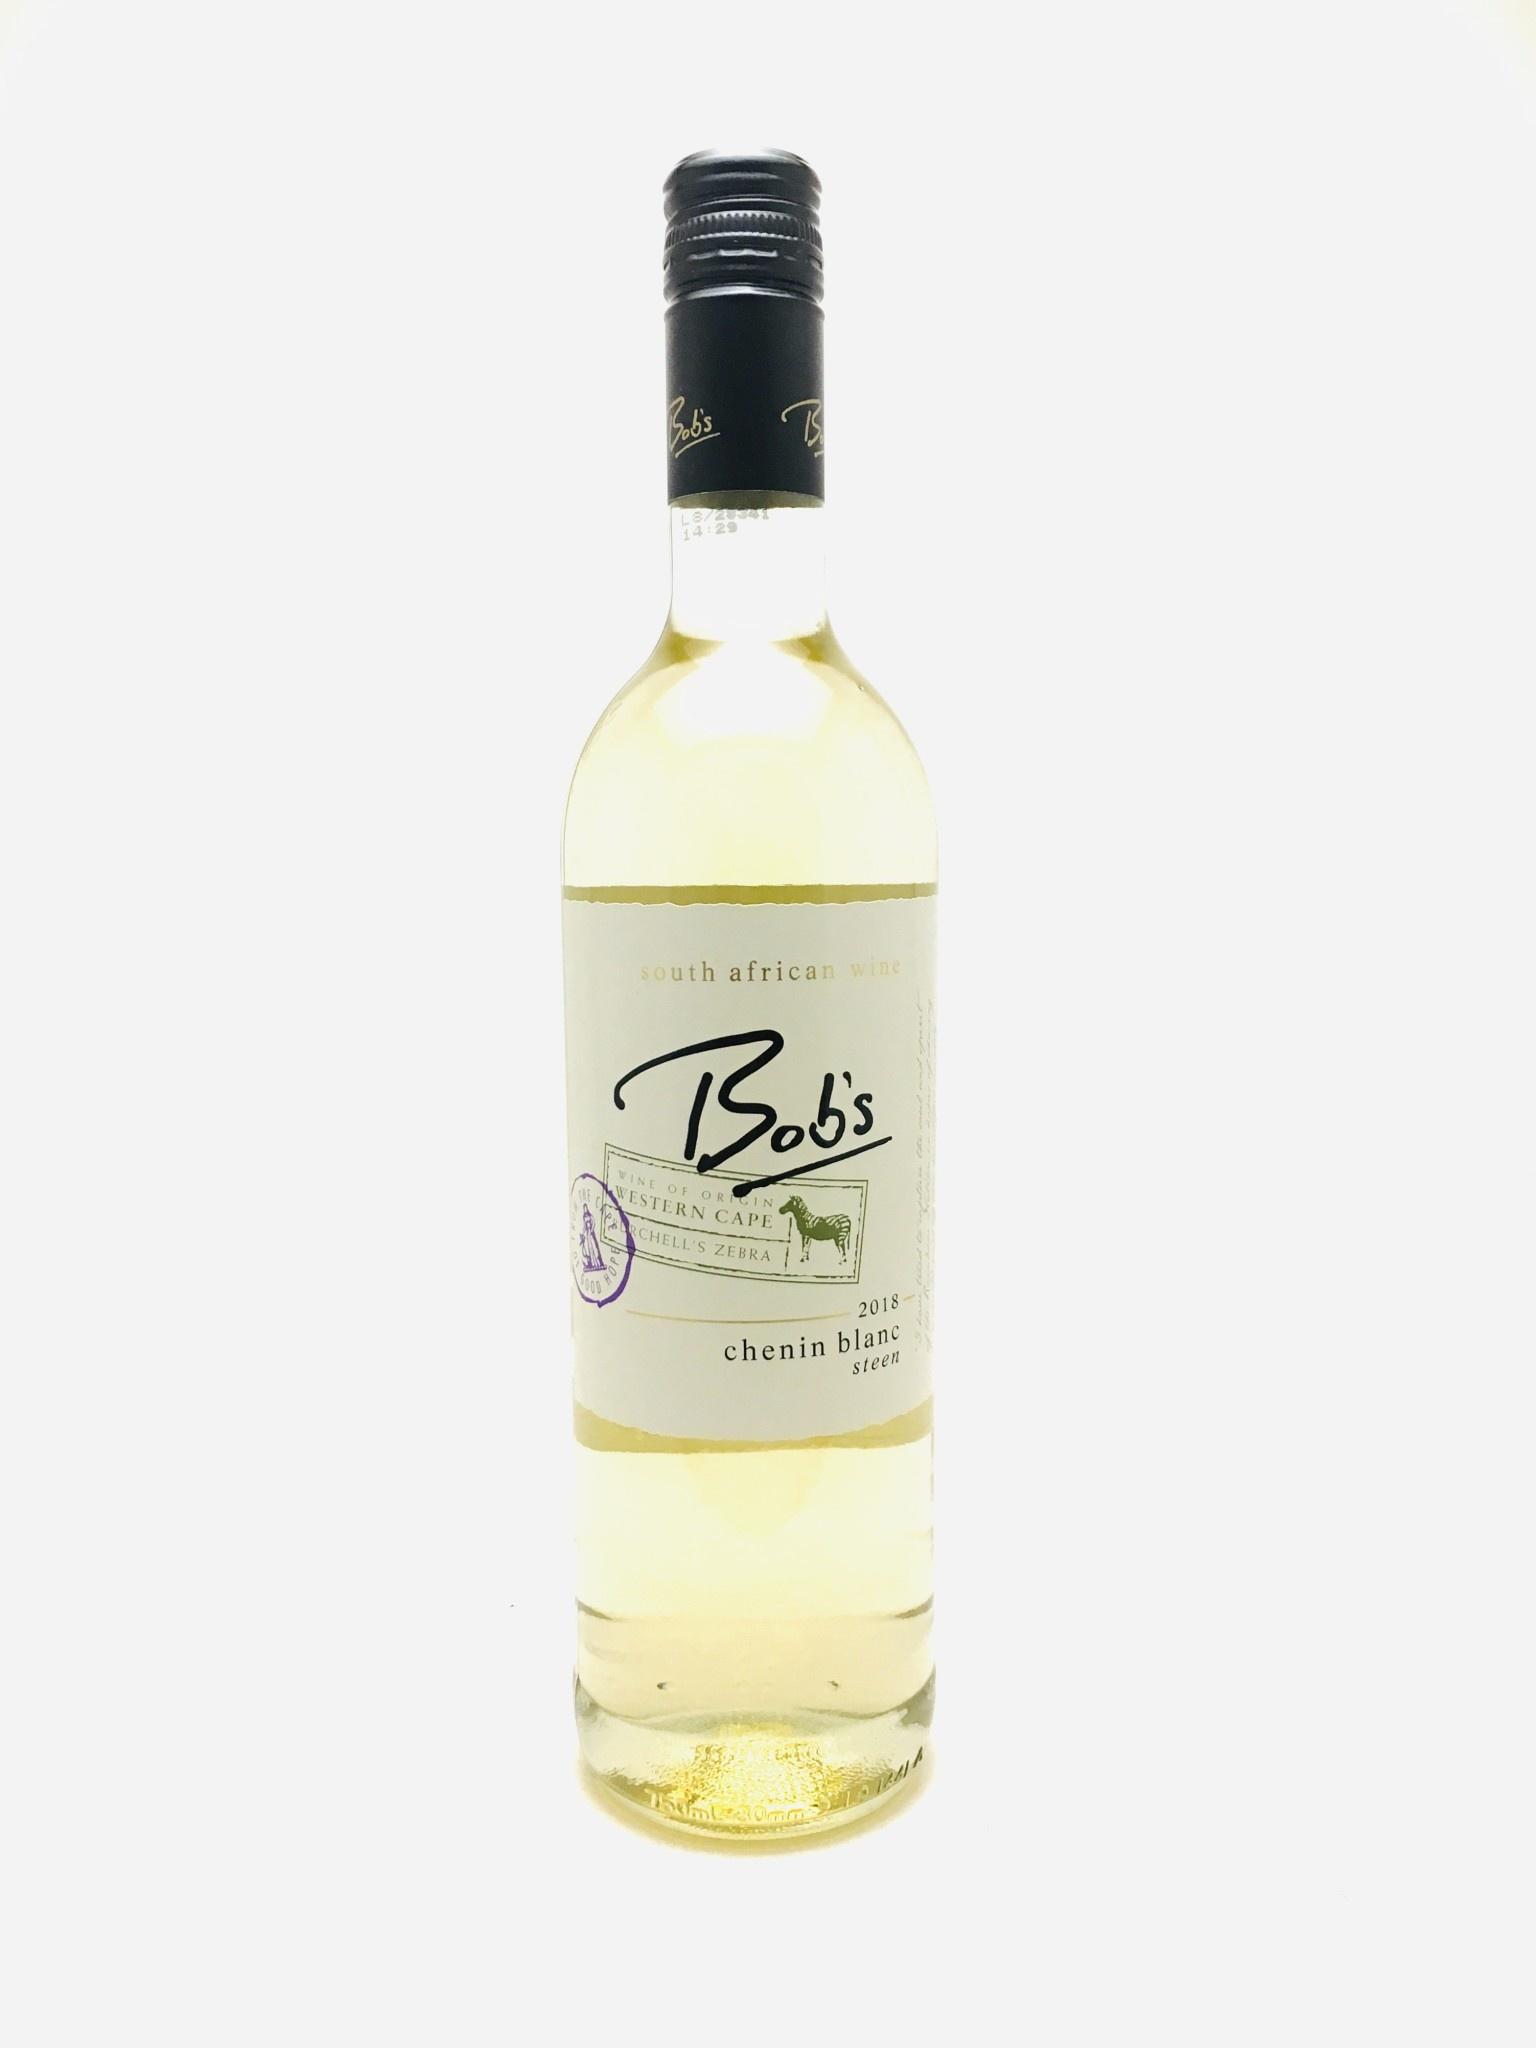 Bob's Chenin Blanc Western Cape South Africa 2018